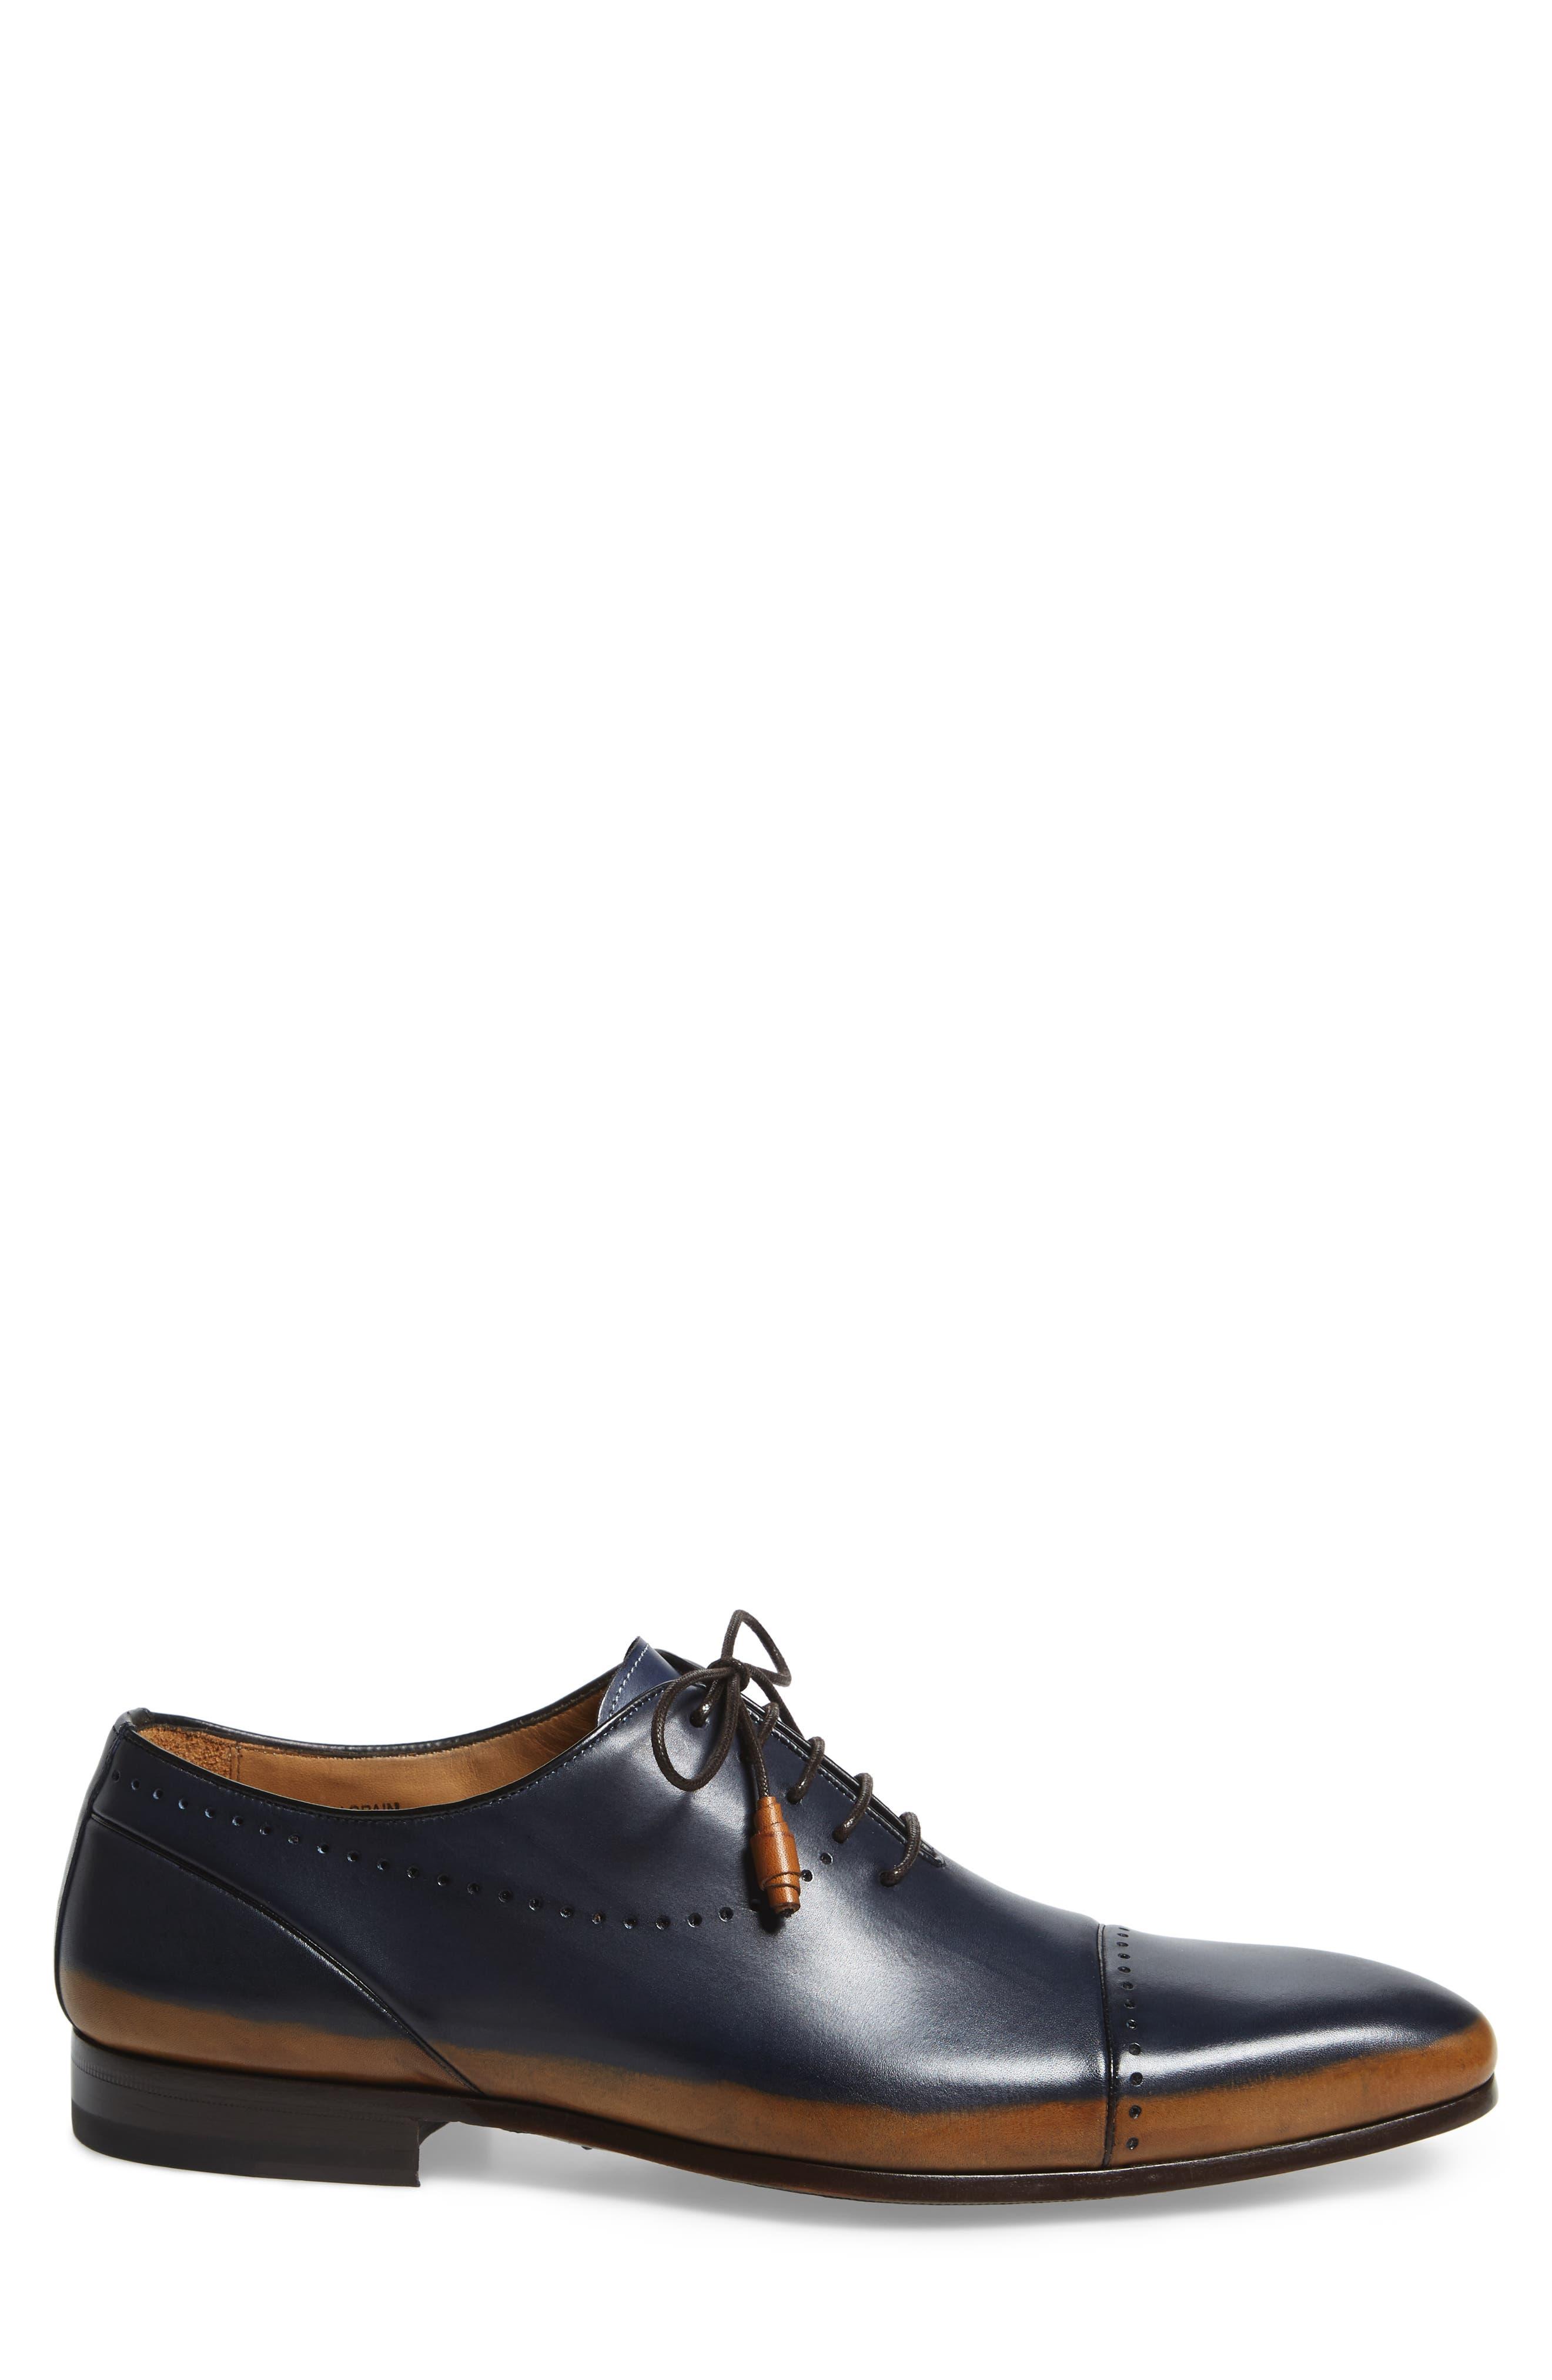 Icaro Cap Toe Oxford,                             Alternate thumbnail 3, color,                             Tan/ Blue Leather